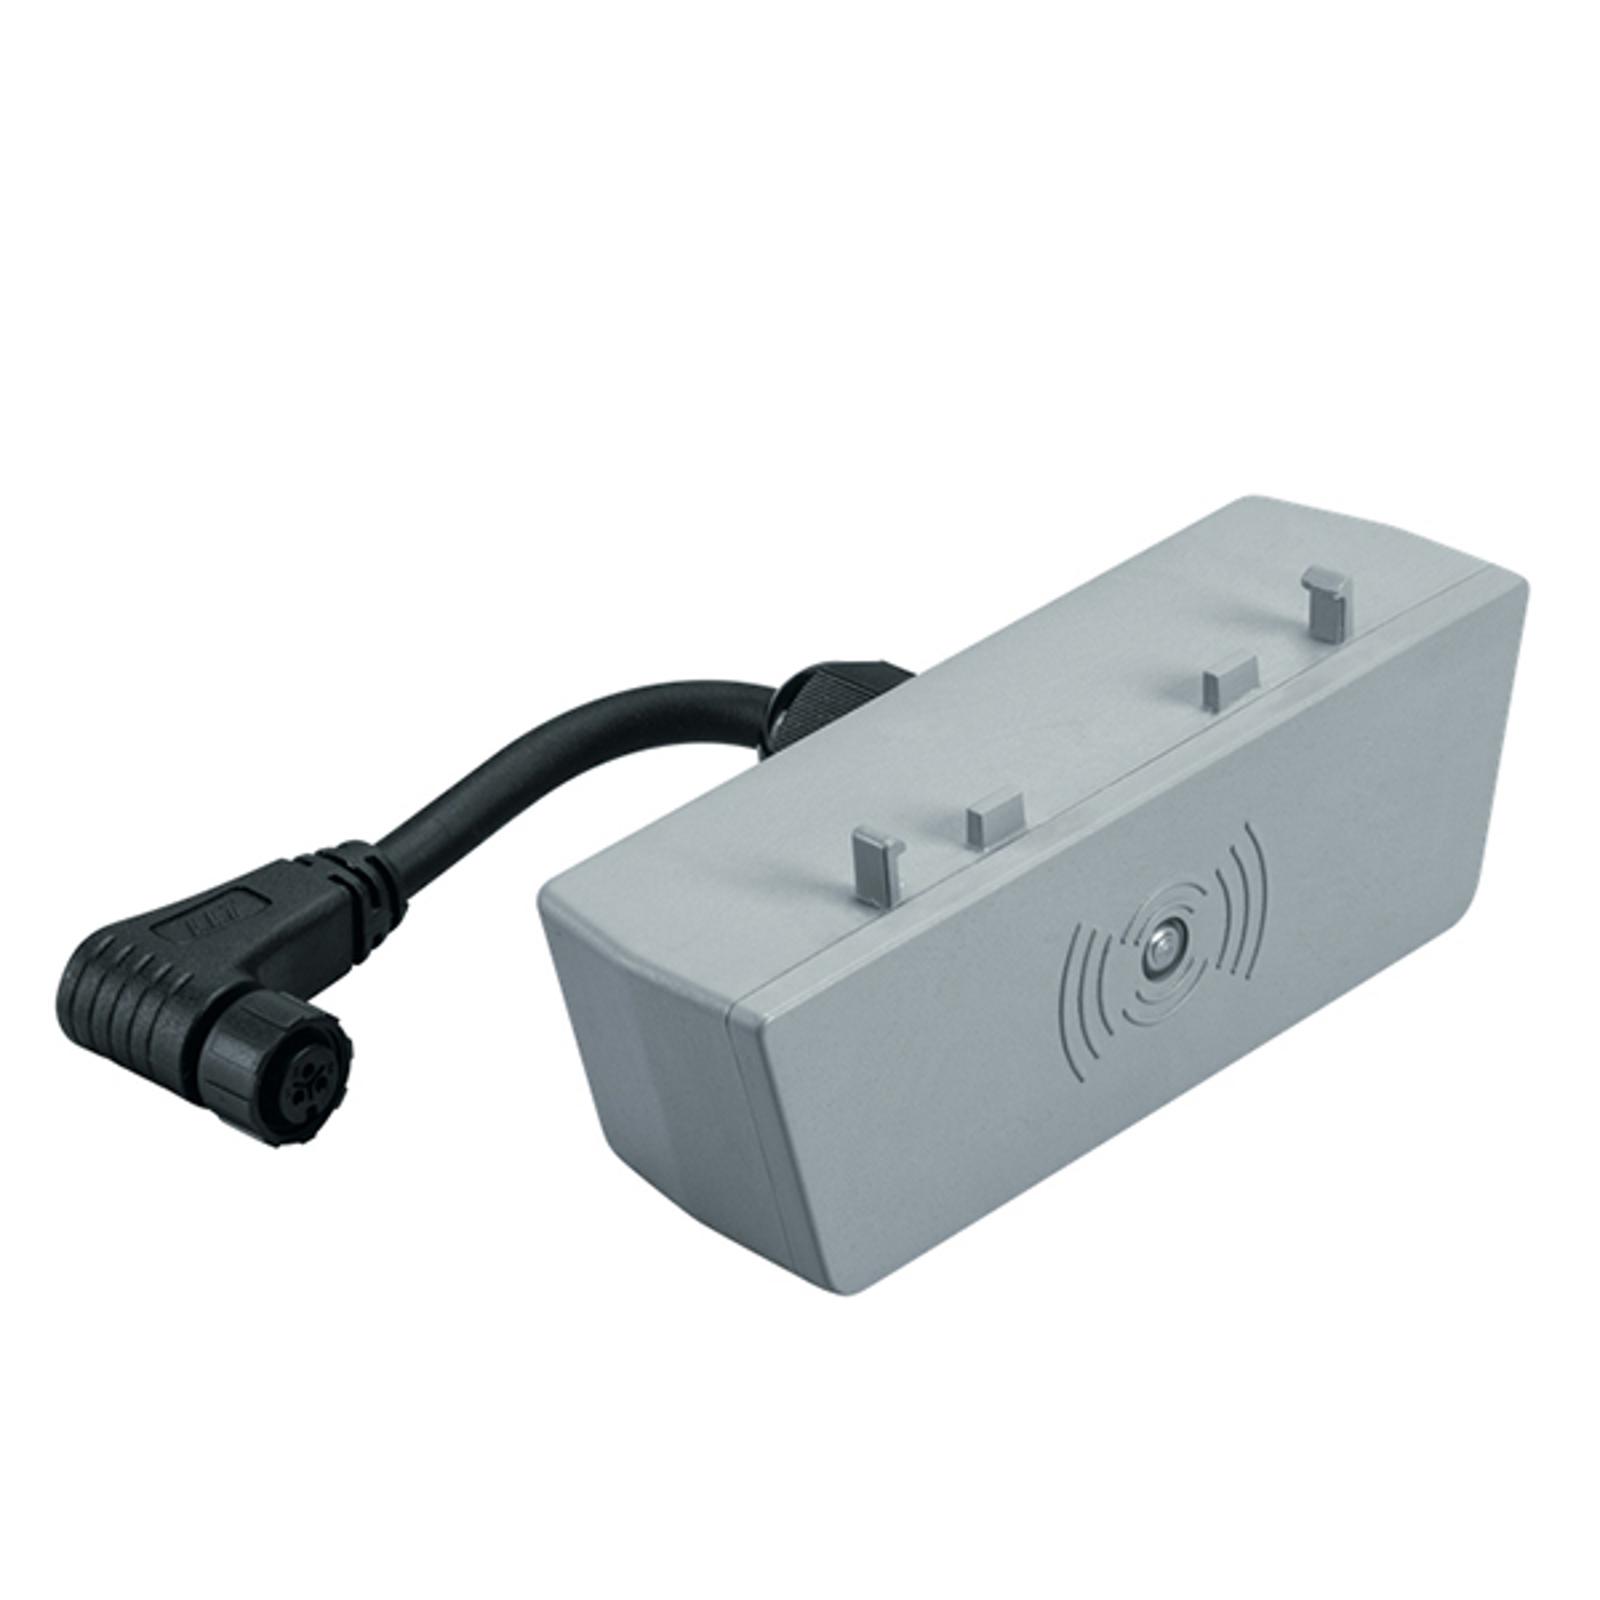 THORNeco Plug&Play Sensor für LED-Strahler Leonie